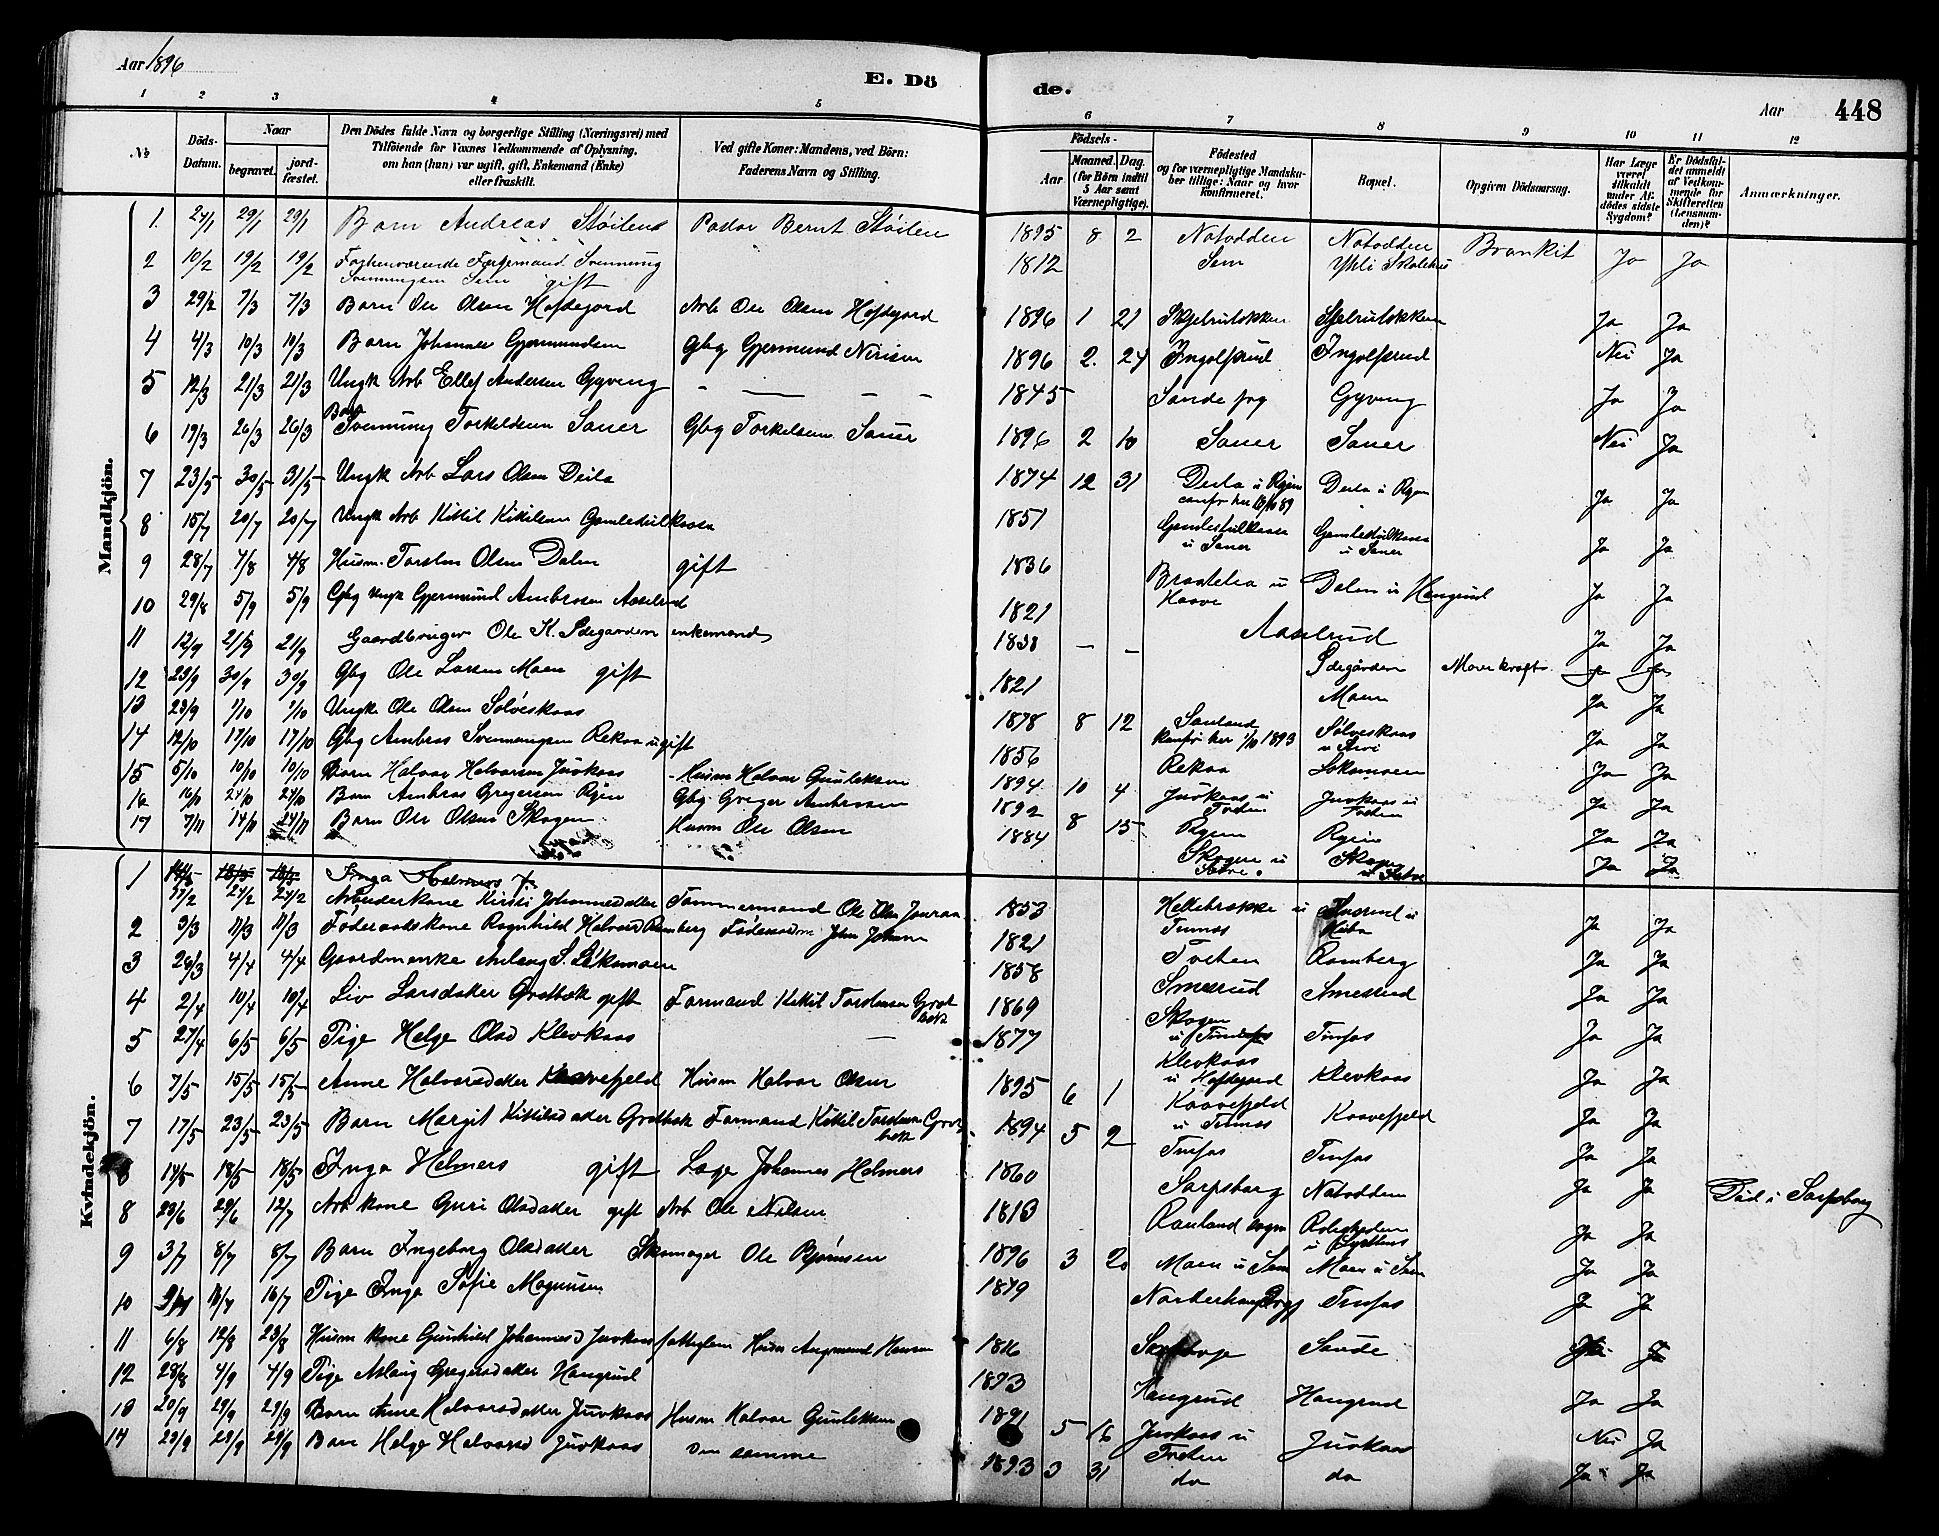 SAKO, Heddal kirkebøker, G/Ga/L0002: Klokkerbok nr. I 2, 1879-1908, s. 448